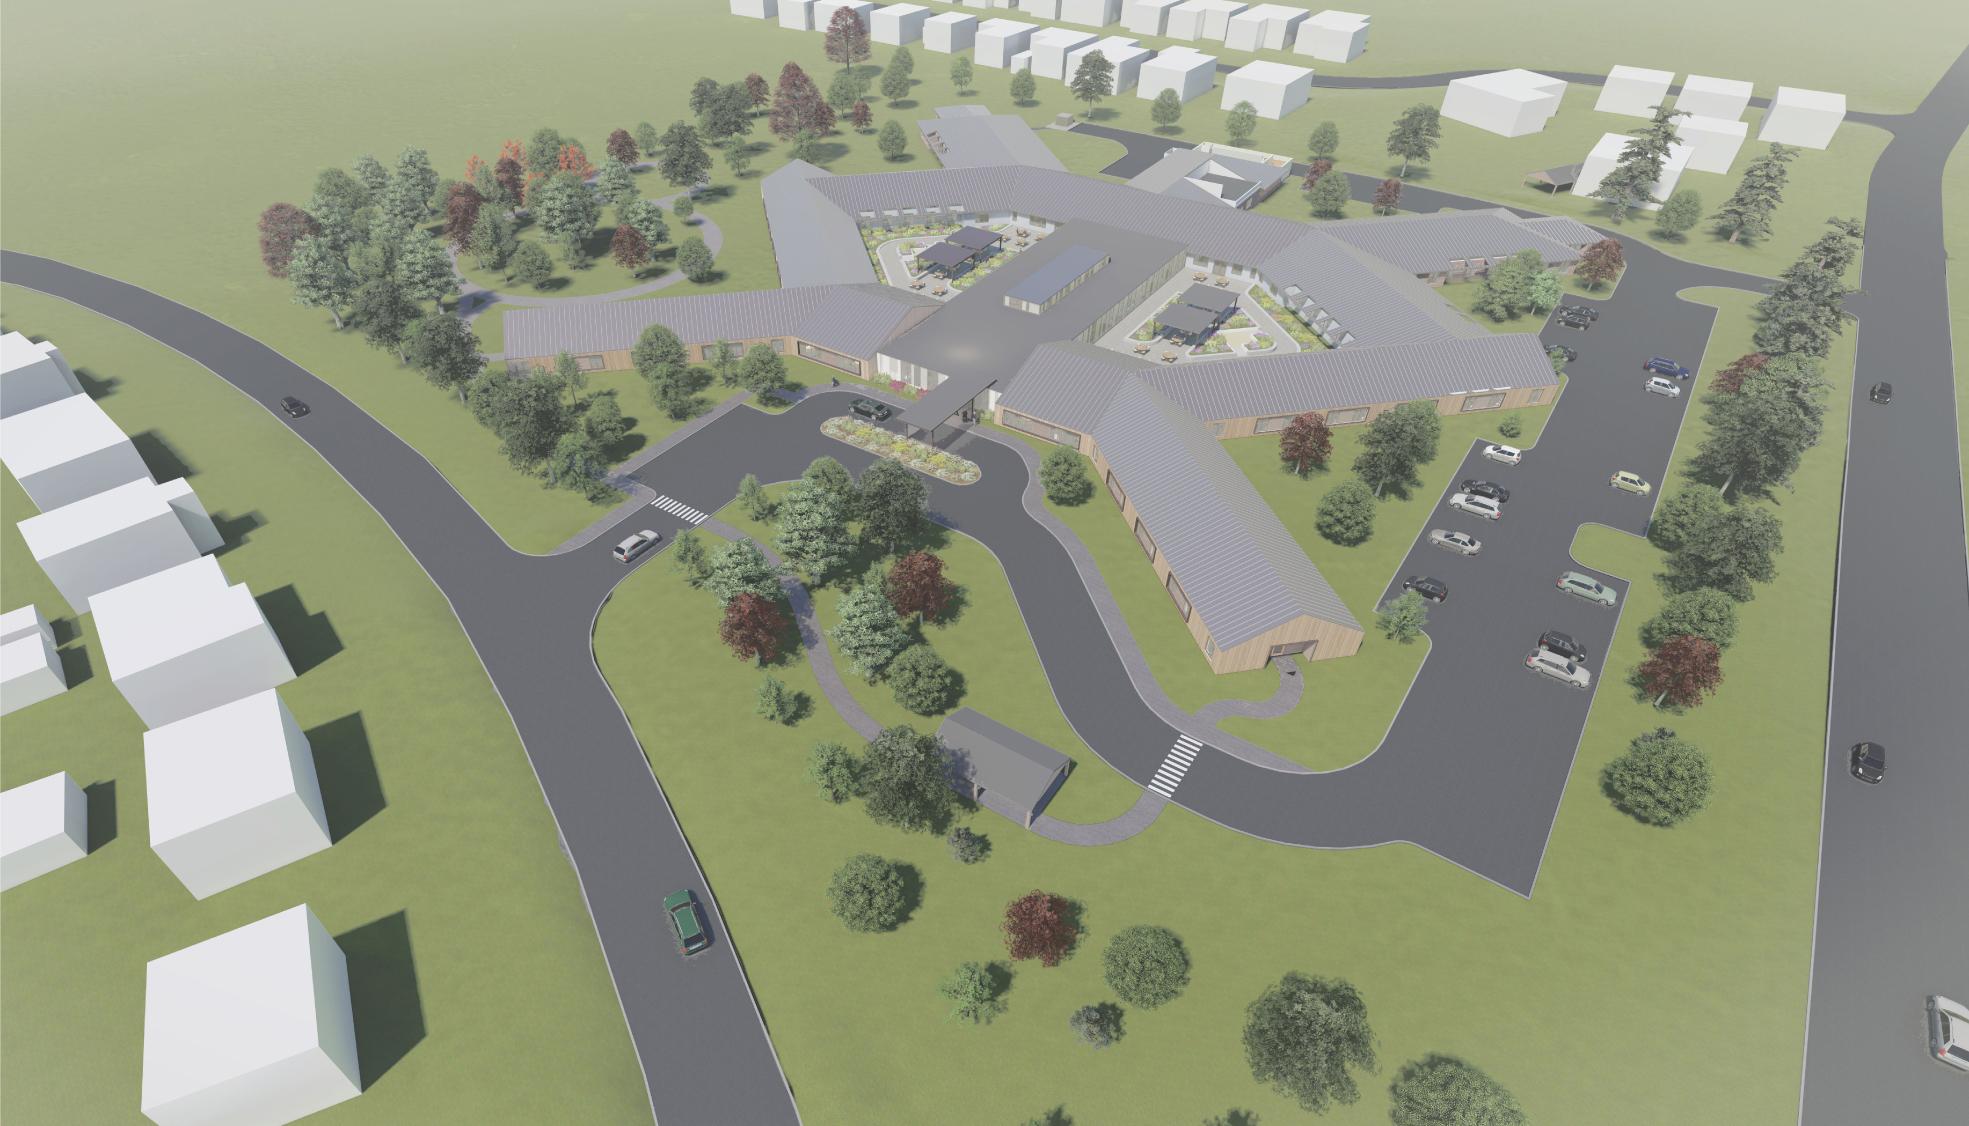 Woodland Villa plans 33k sq. ft. expansion